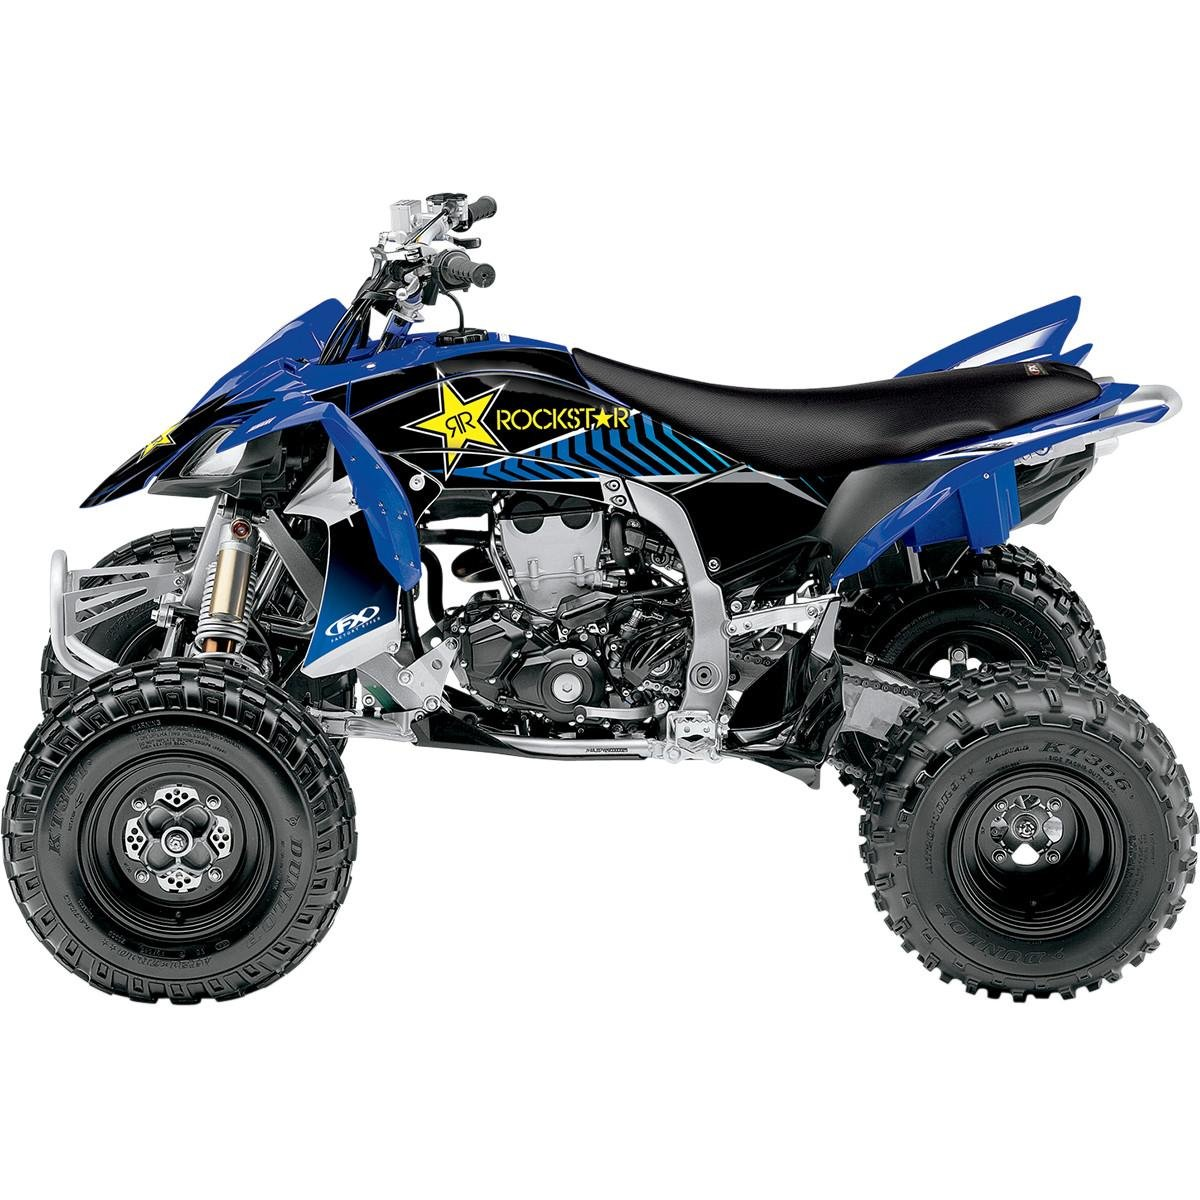 Factory Effex 16-14274 ATV Graphic Kit